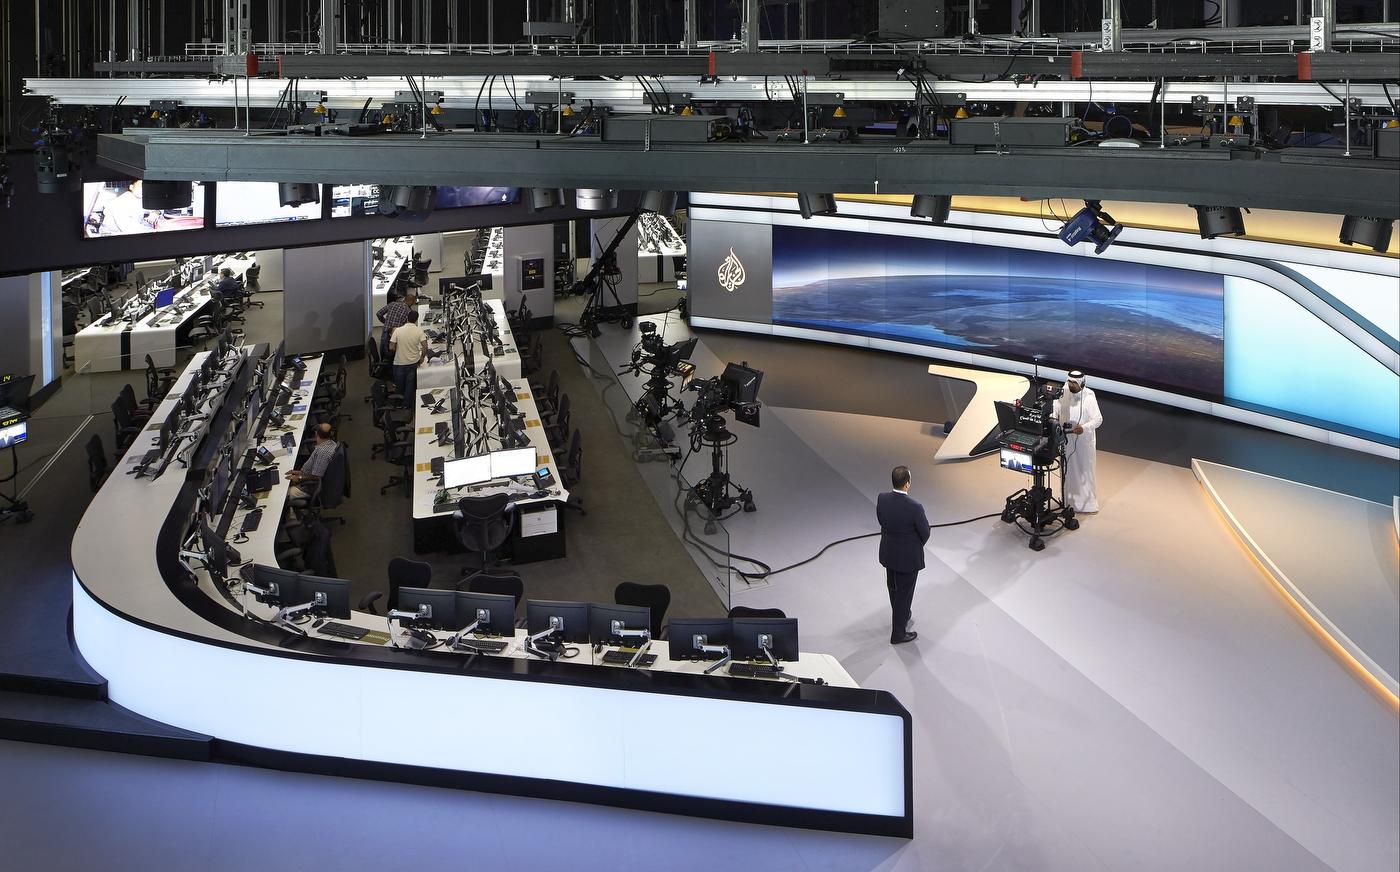 NCS_Al-Jazeera-Newsroom-Studio-5_0009